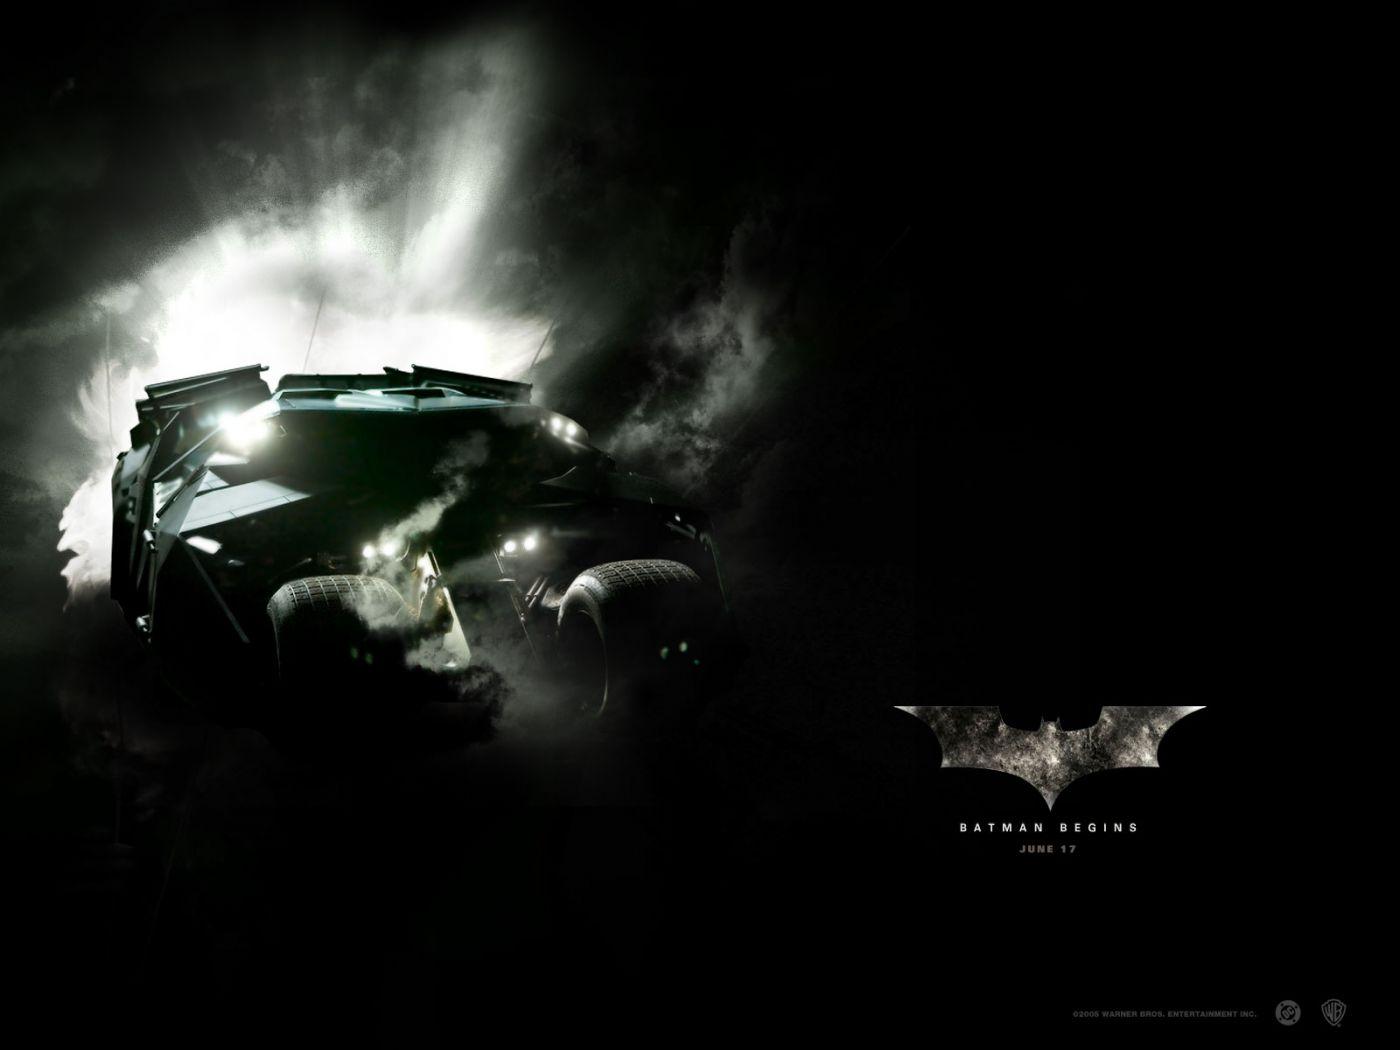 Batmobile Batman Begins Poster Wallpaper 1400x1050